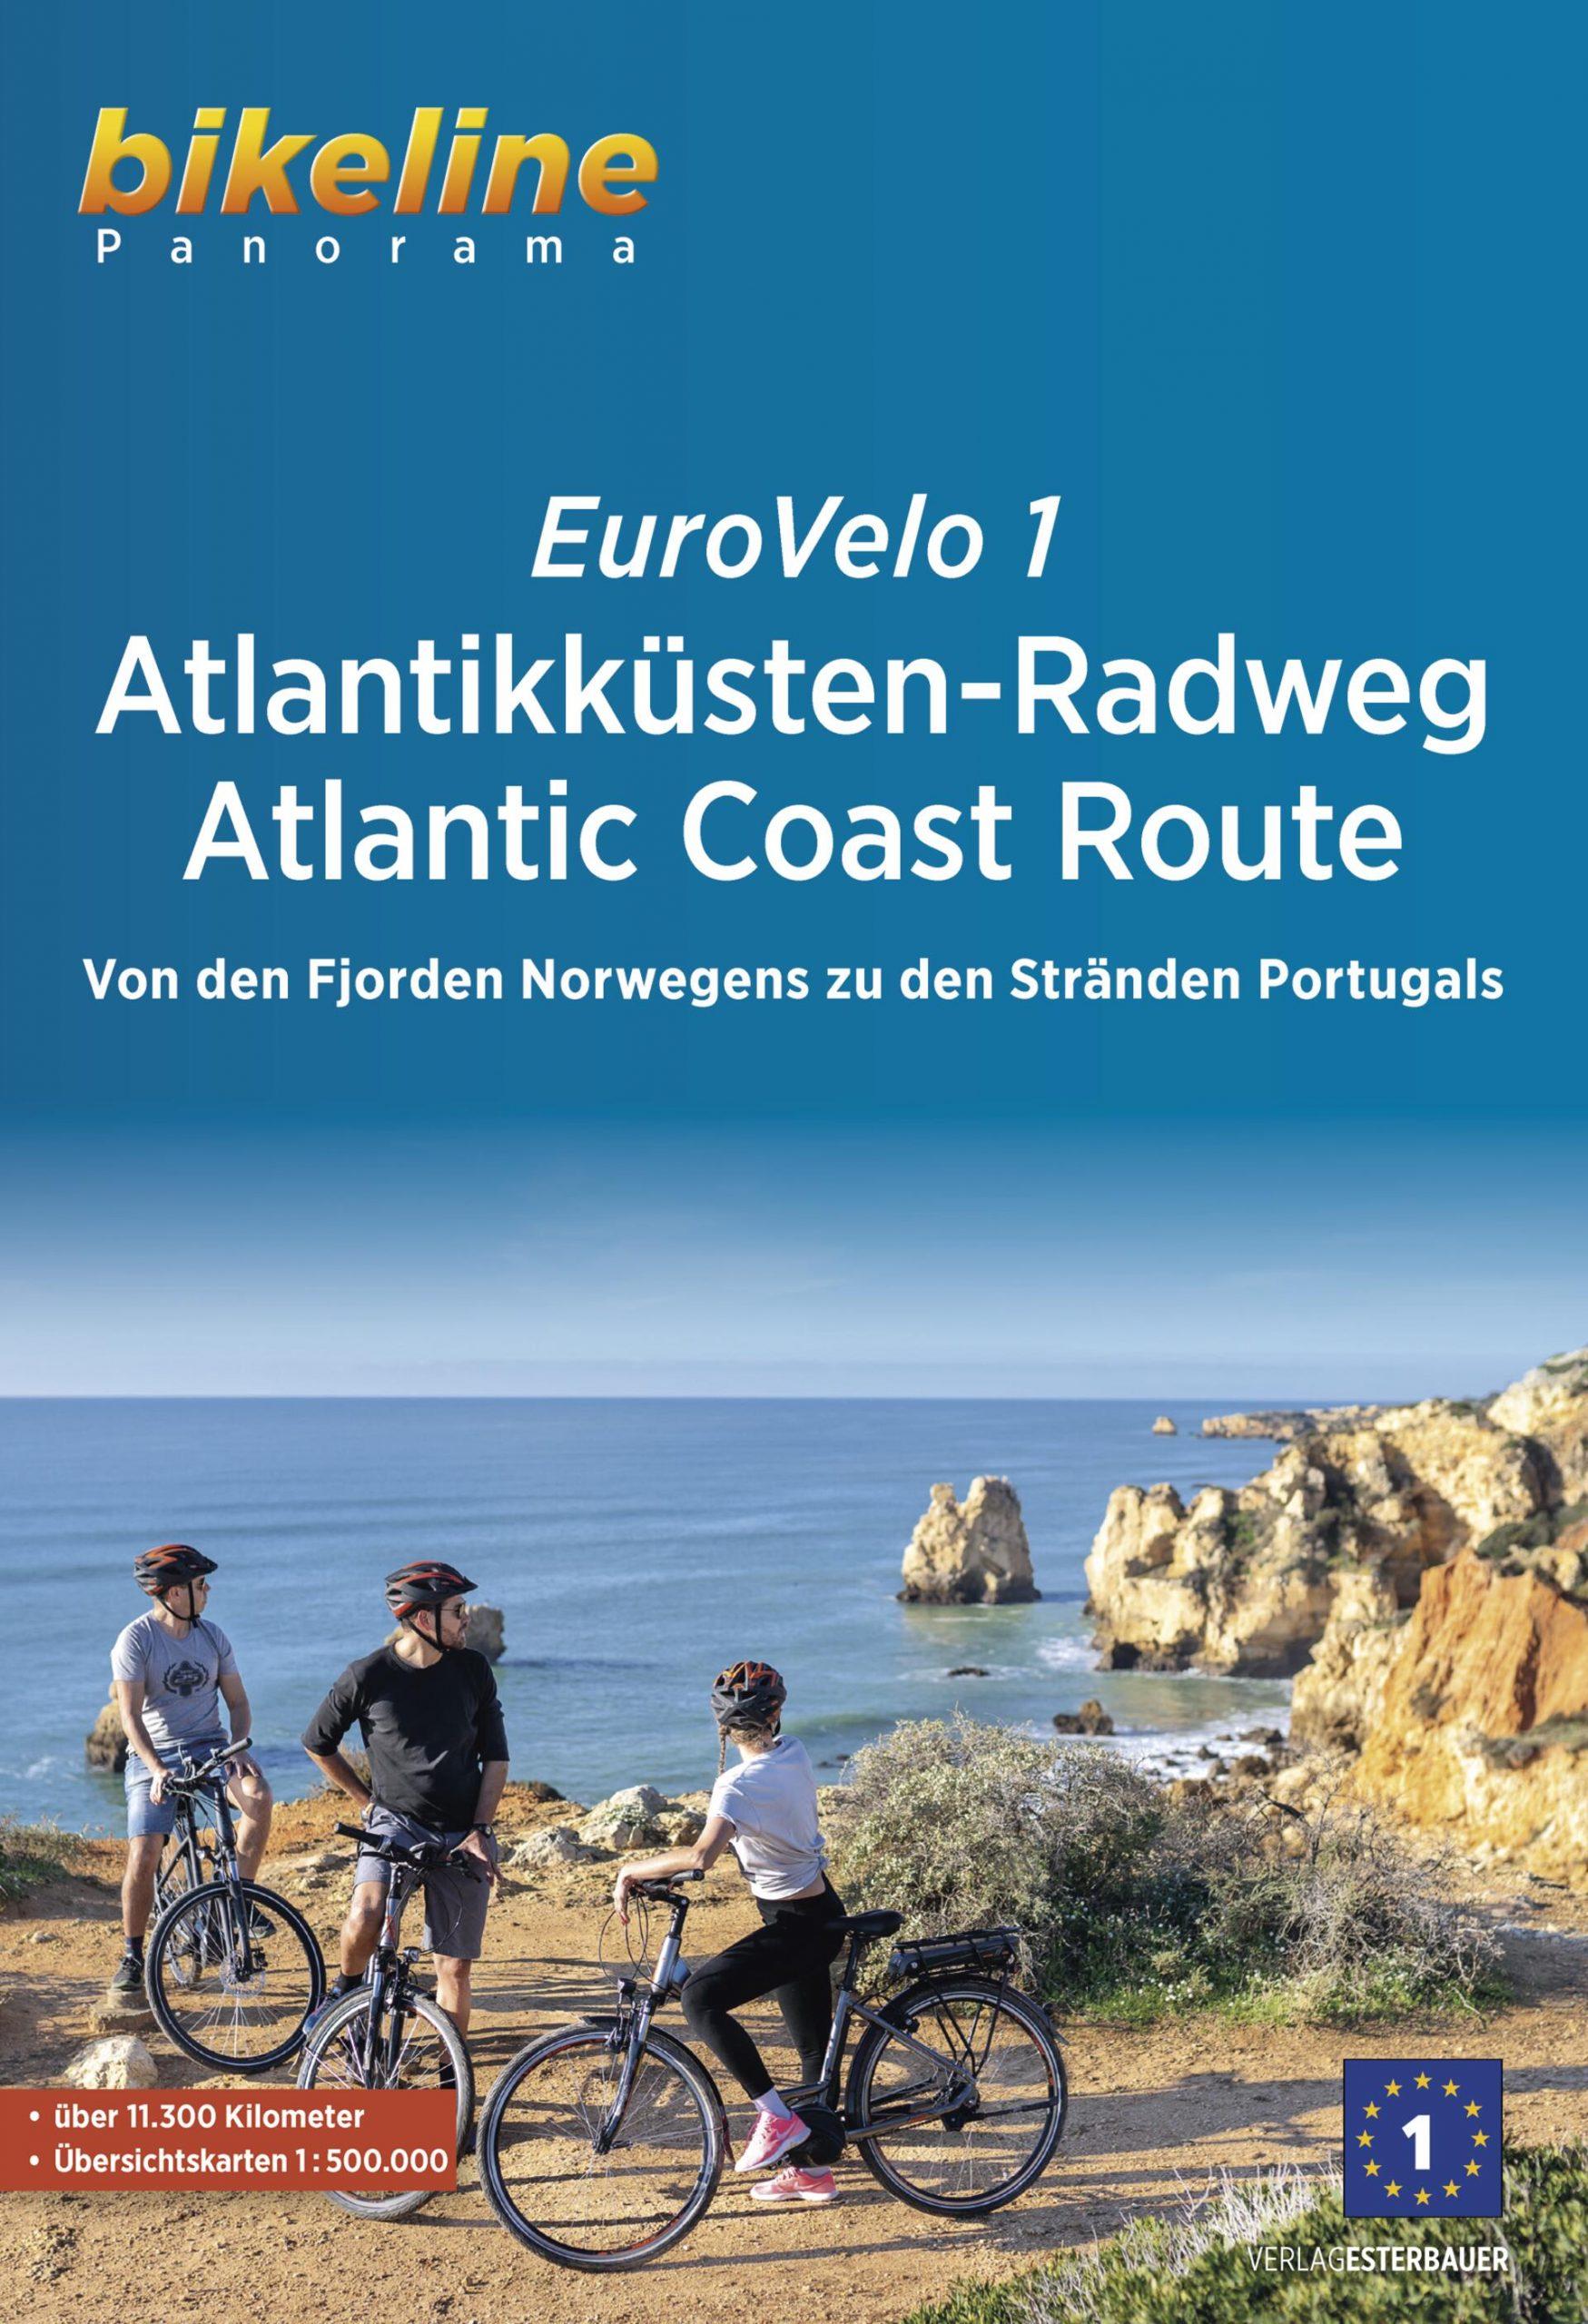 Foto vom Eurovelo 1 Atlantikküsten-Radweg Atlantic Coast Route